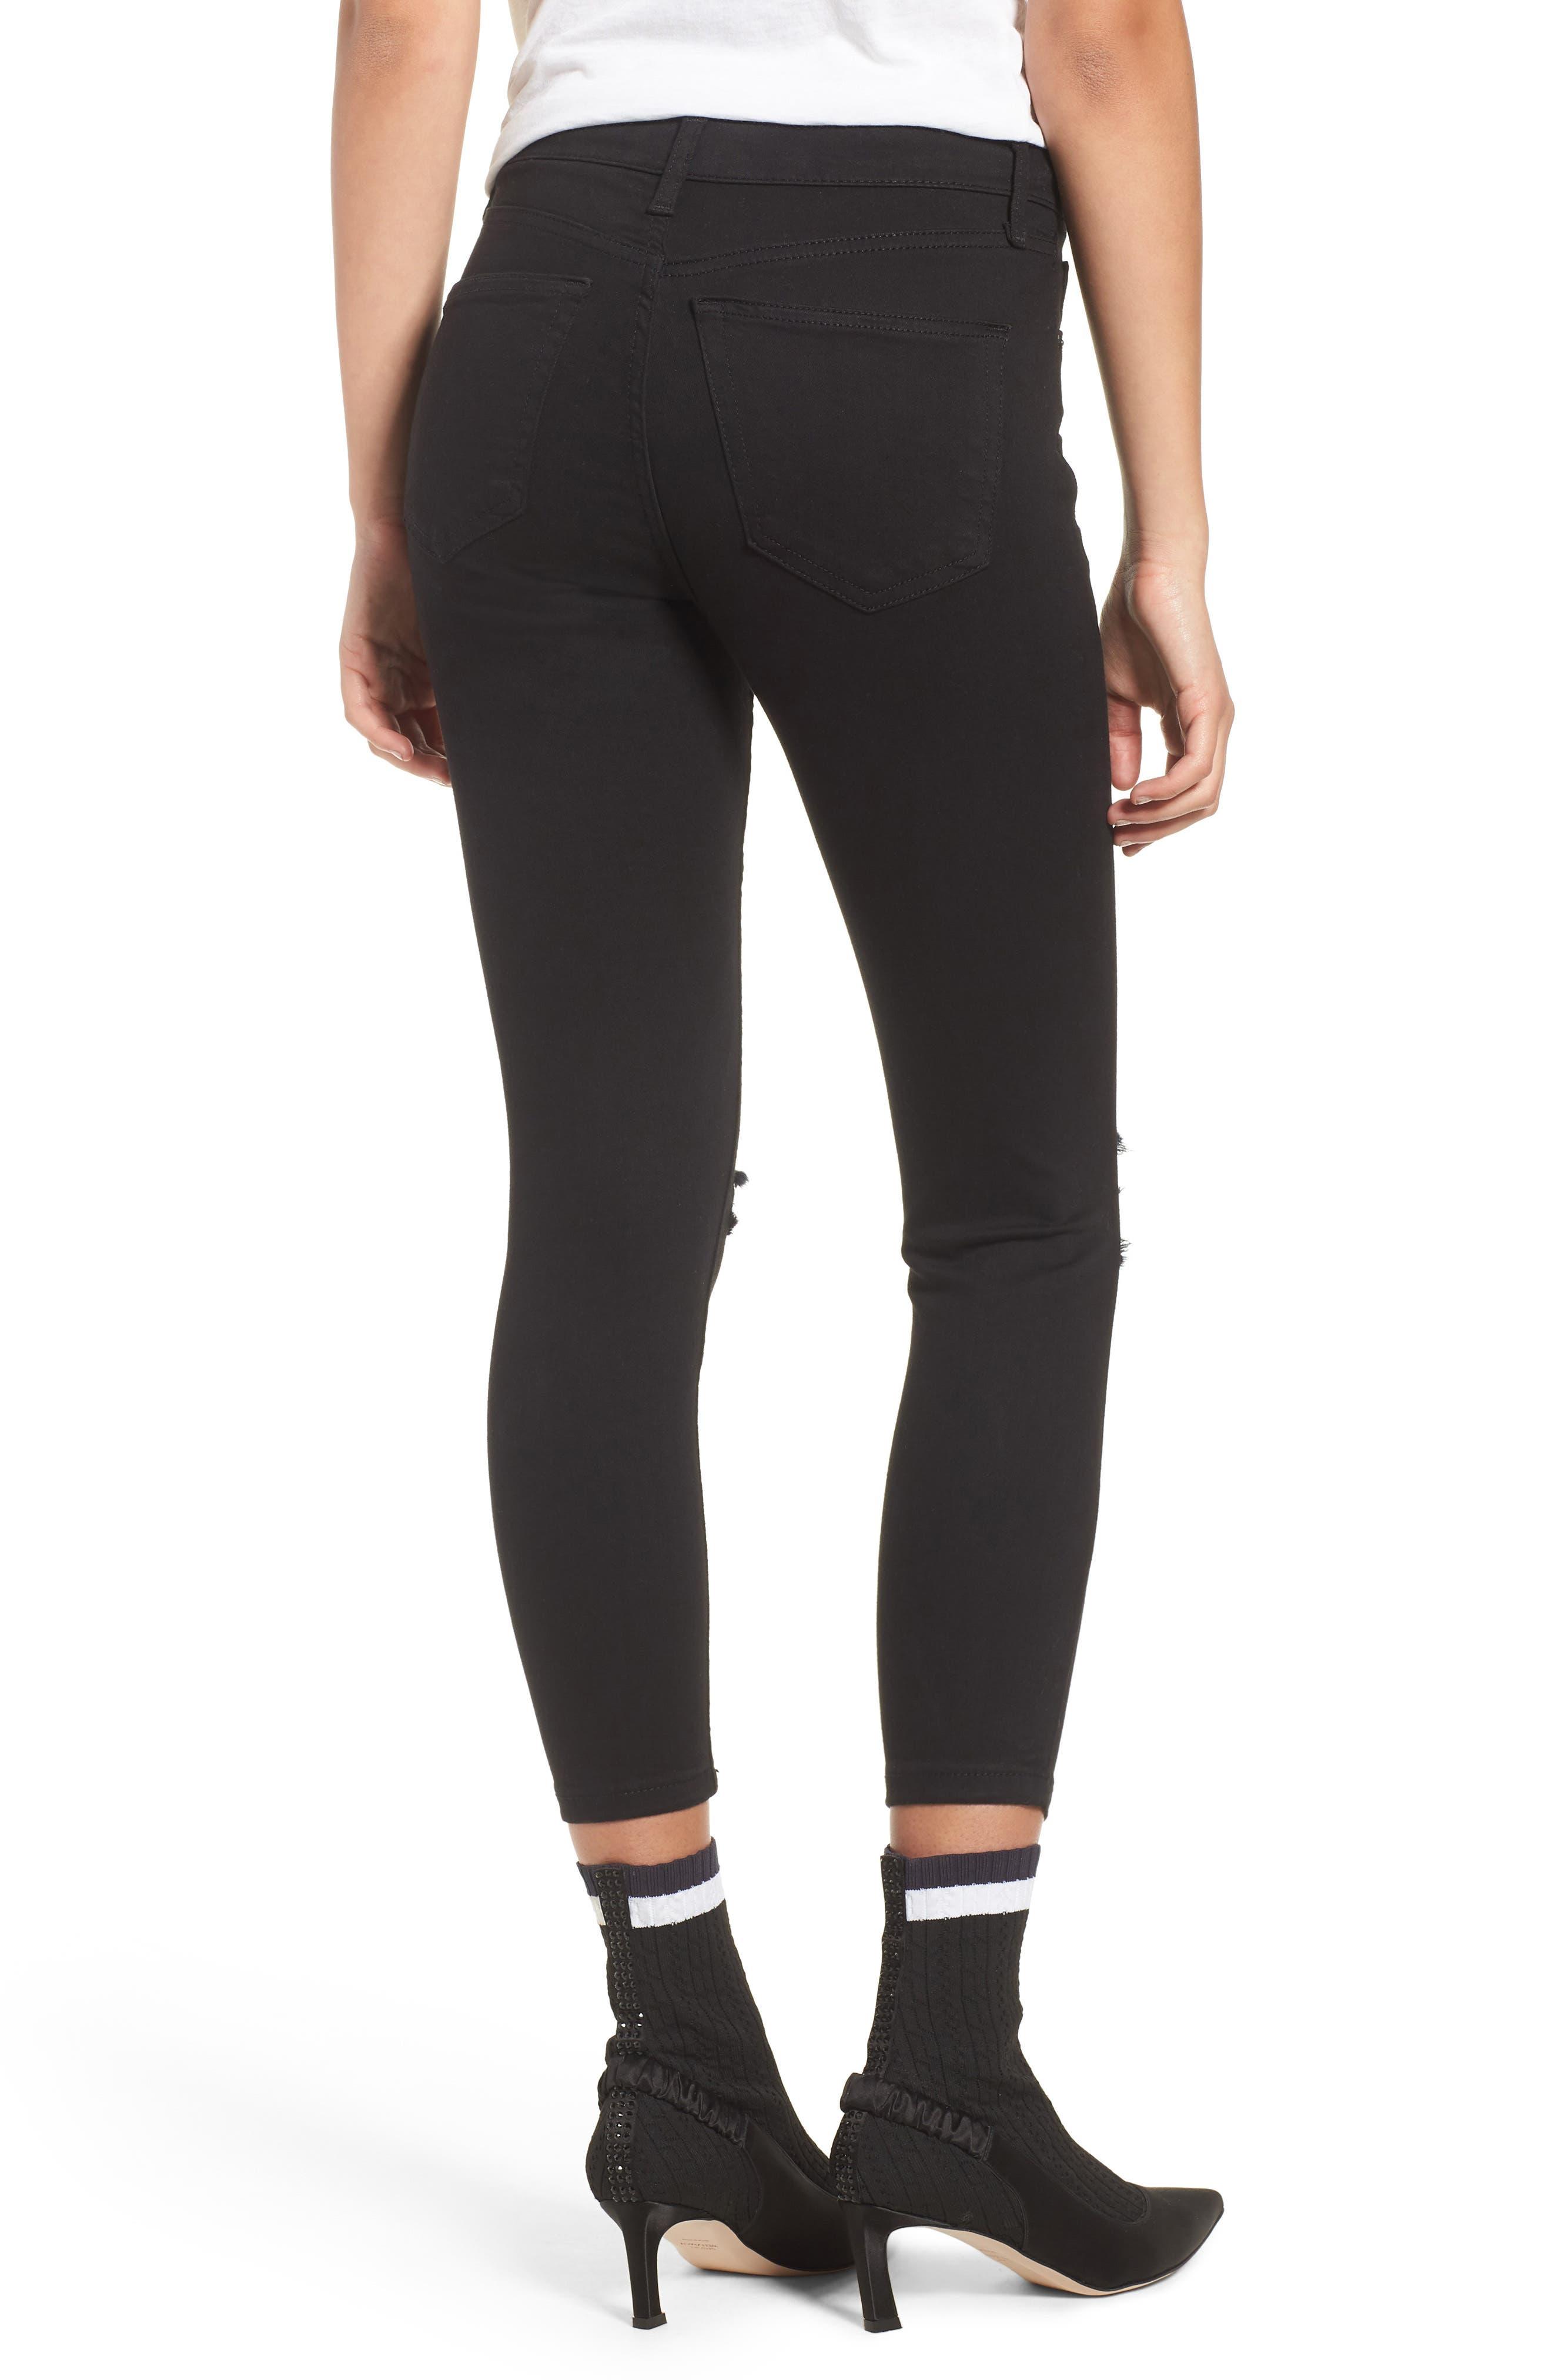 Jamie Ripped Jeans,                             Alternate thumbnail 2, color,                             Black